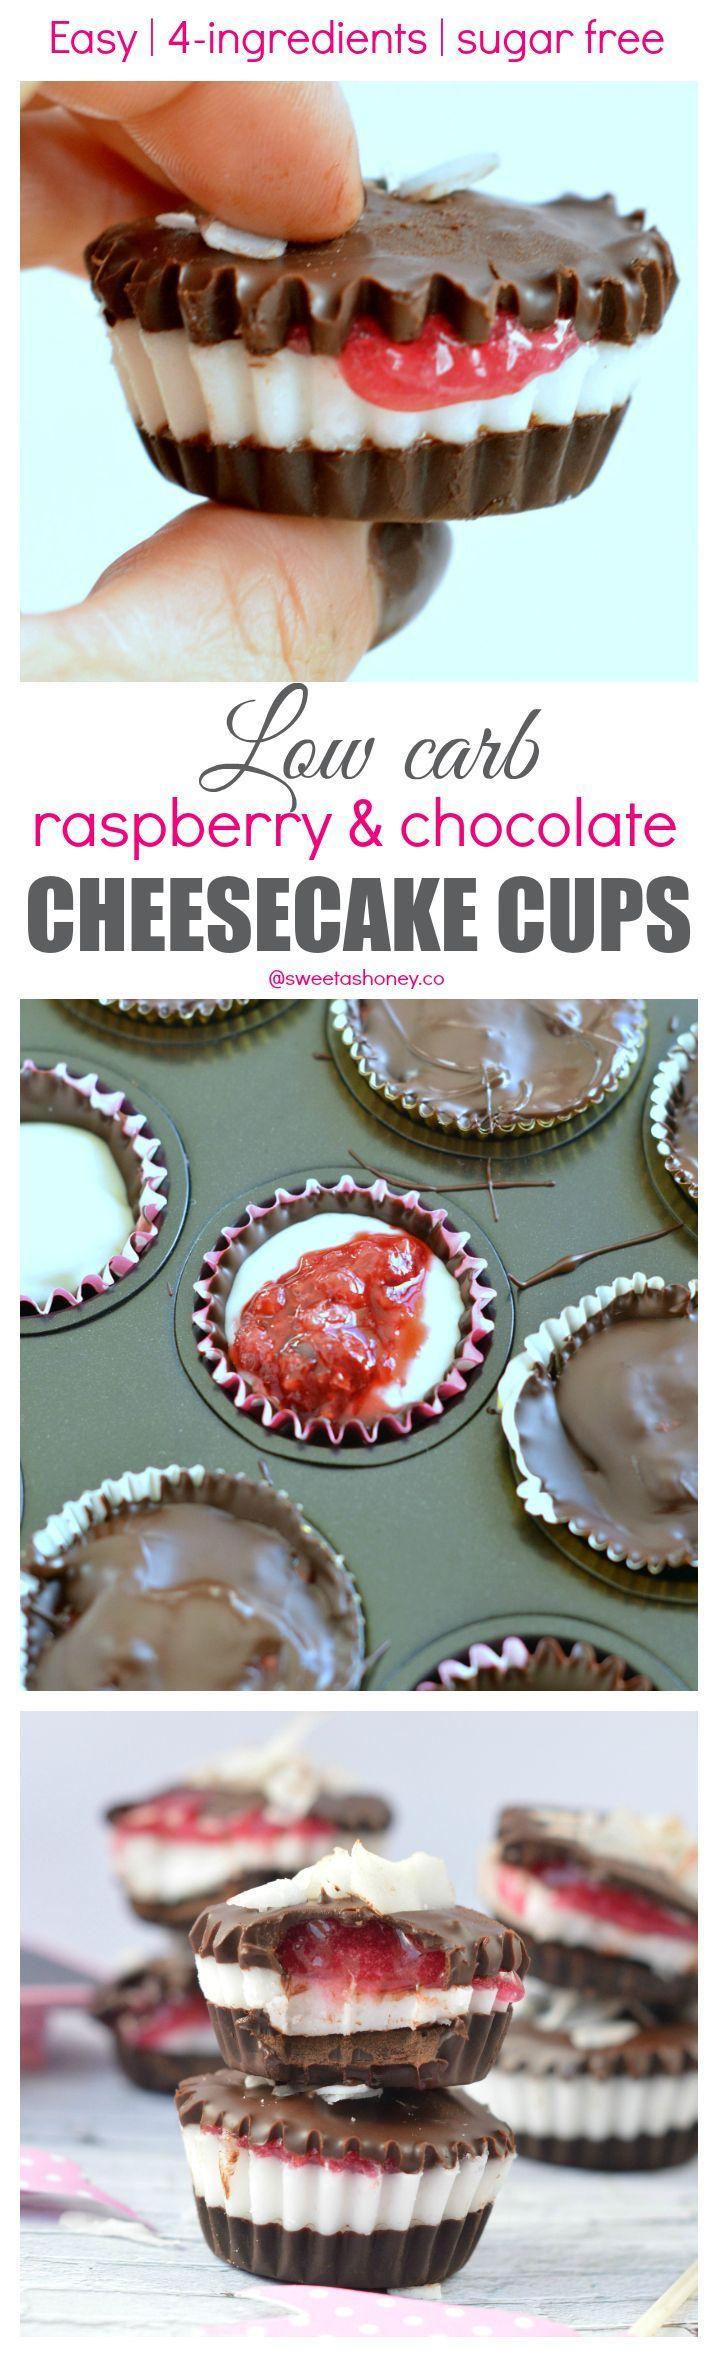 Sugar free vanilla cake Gluten Free Recipe Cakes Vanilla and